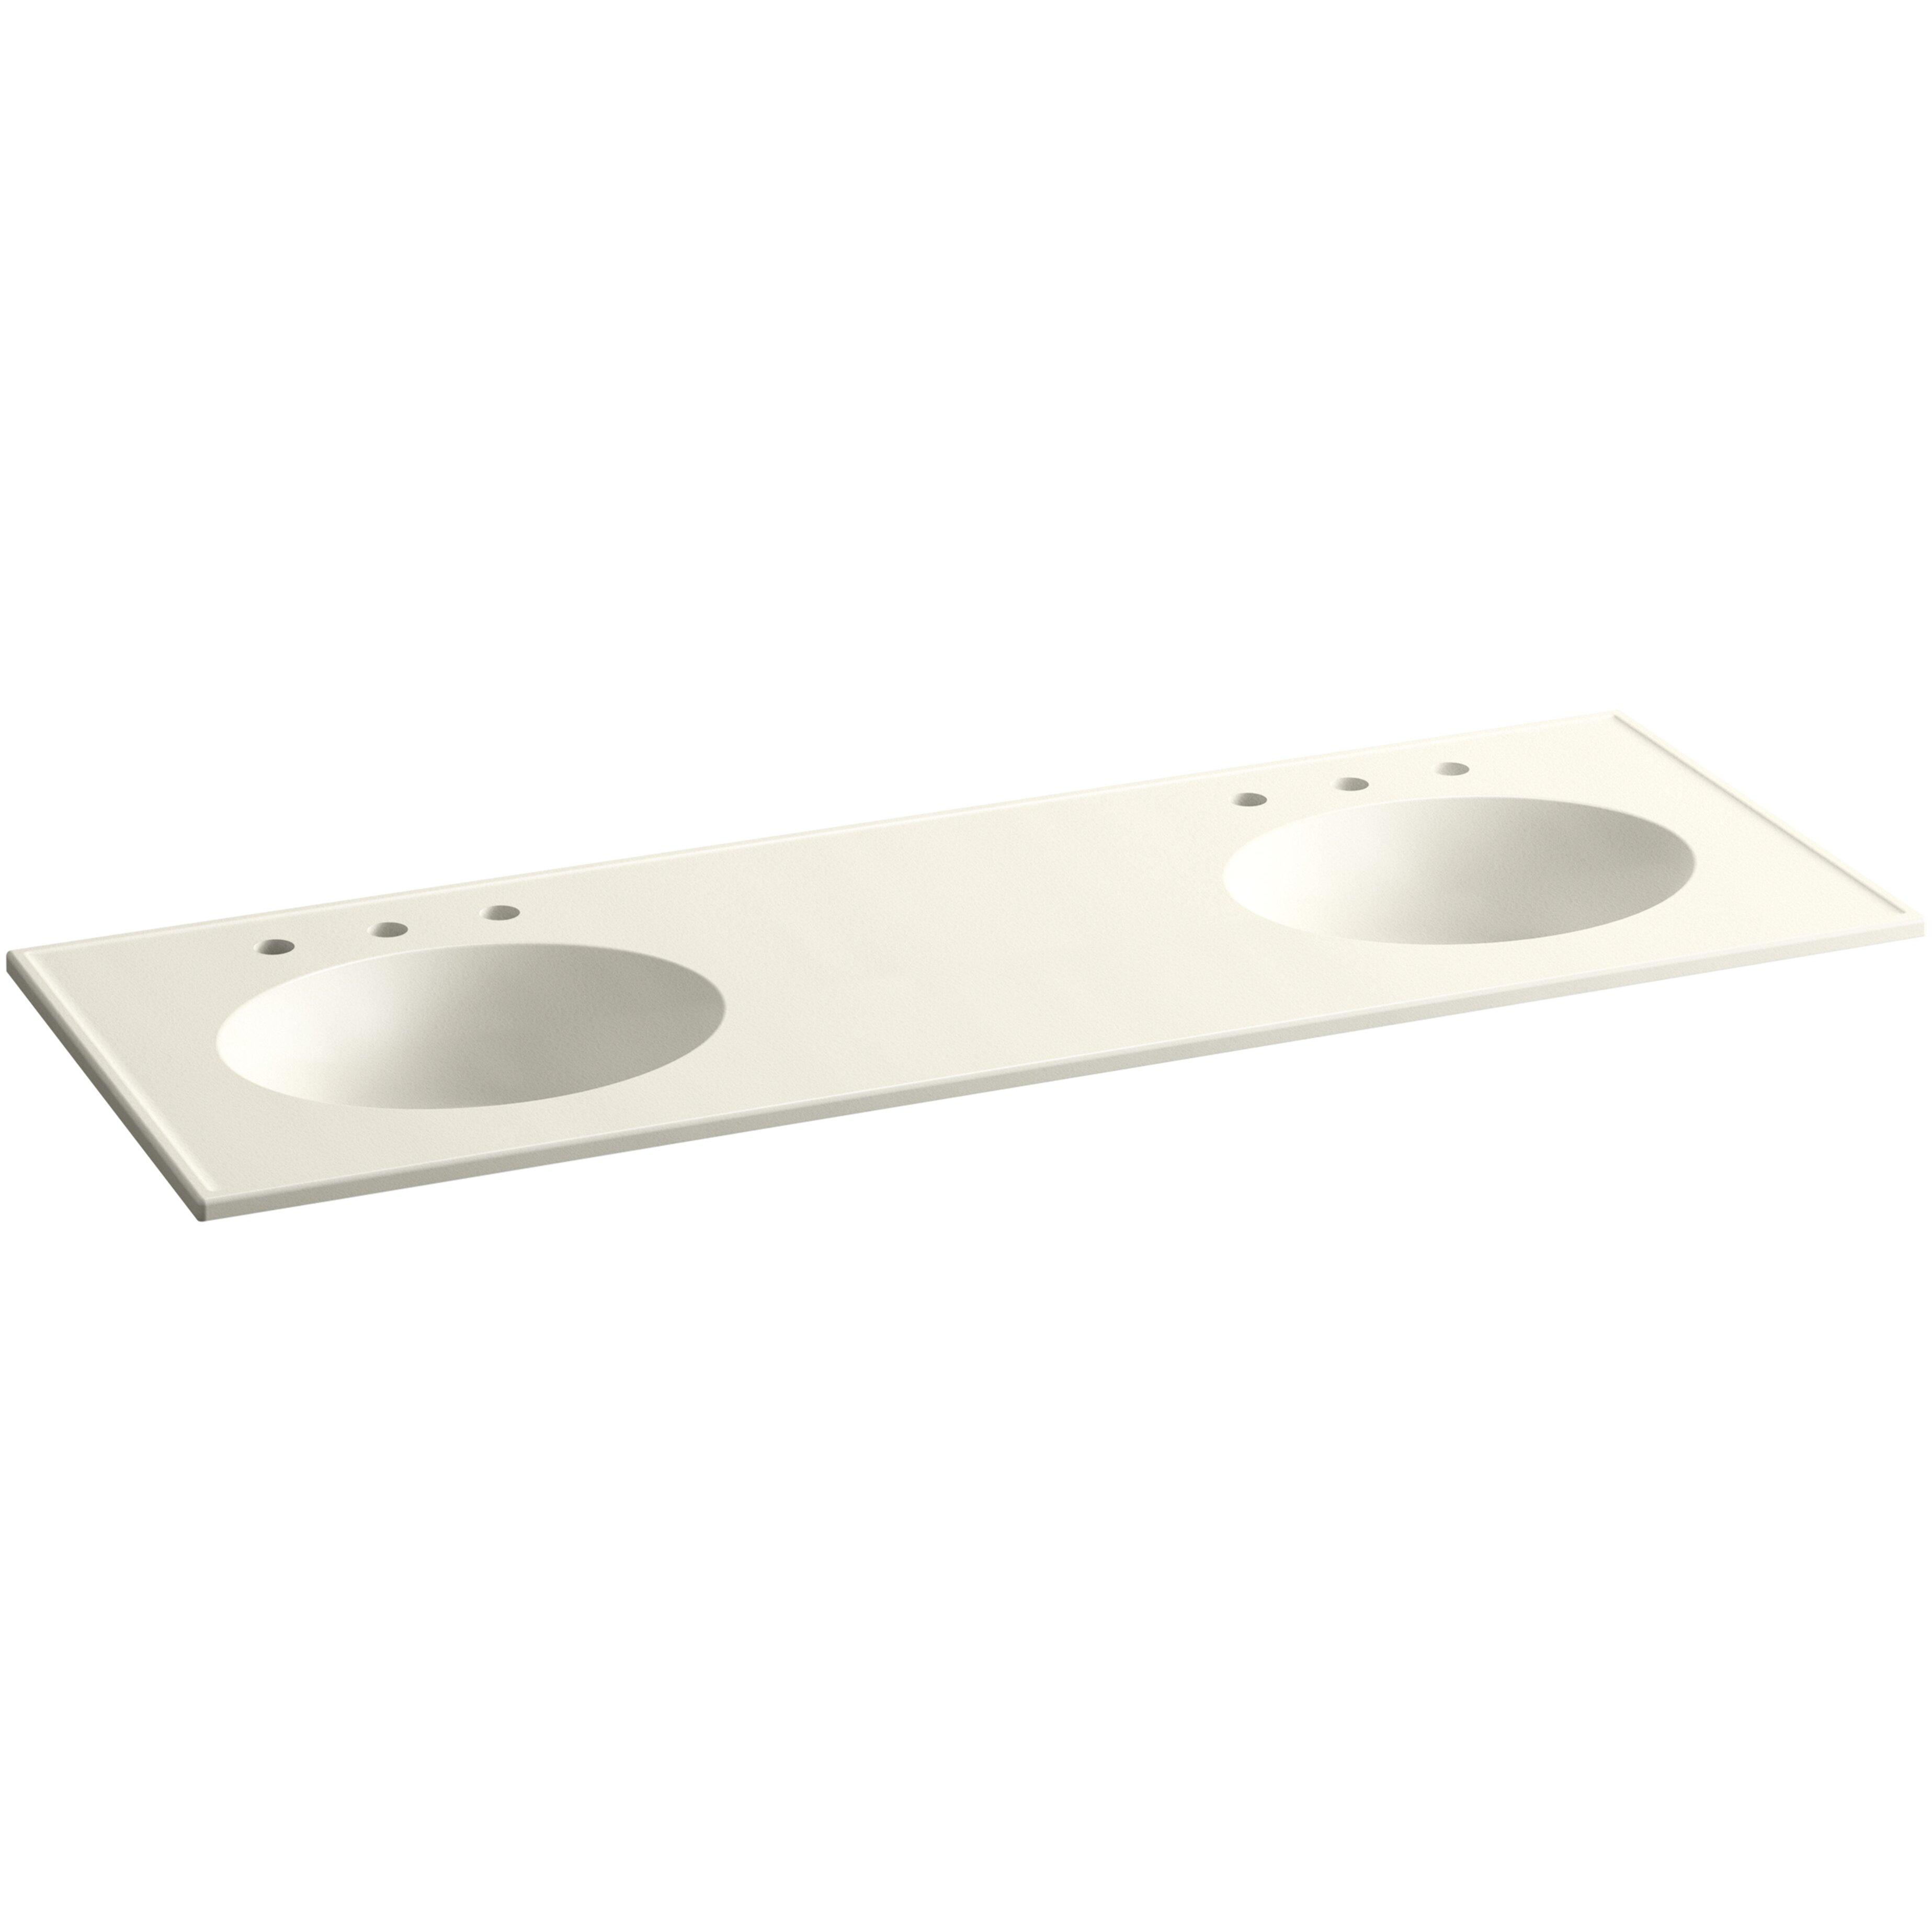 "Kohler Double Bathroom Sink: Kohler Ceramic/Impressions 61"" Oval Double-Bowl Vanity-Top"